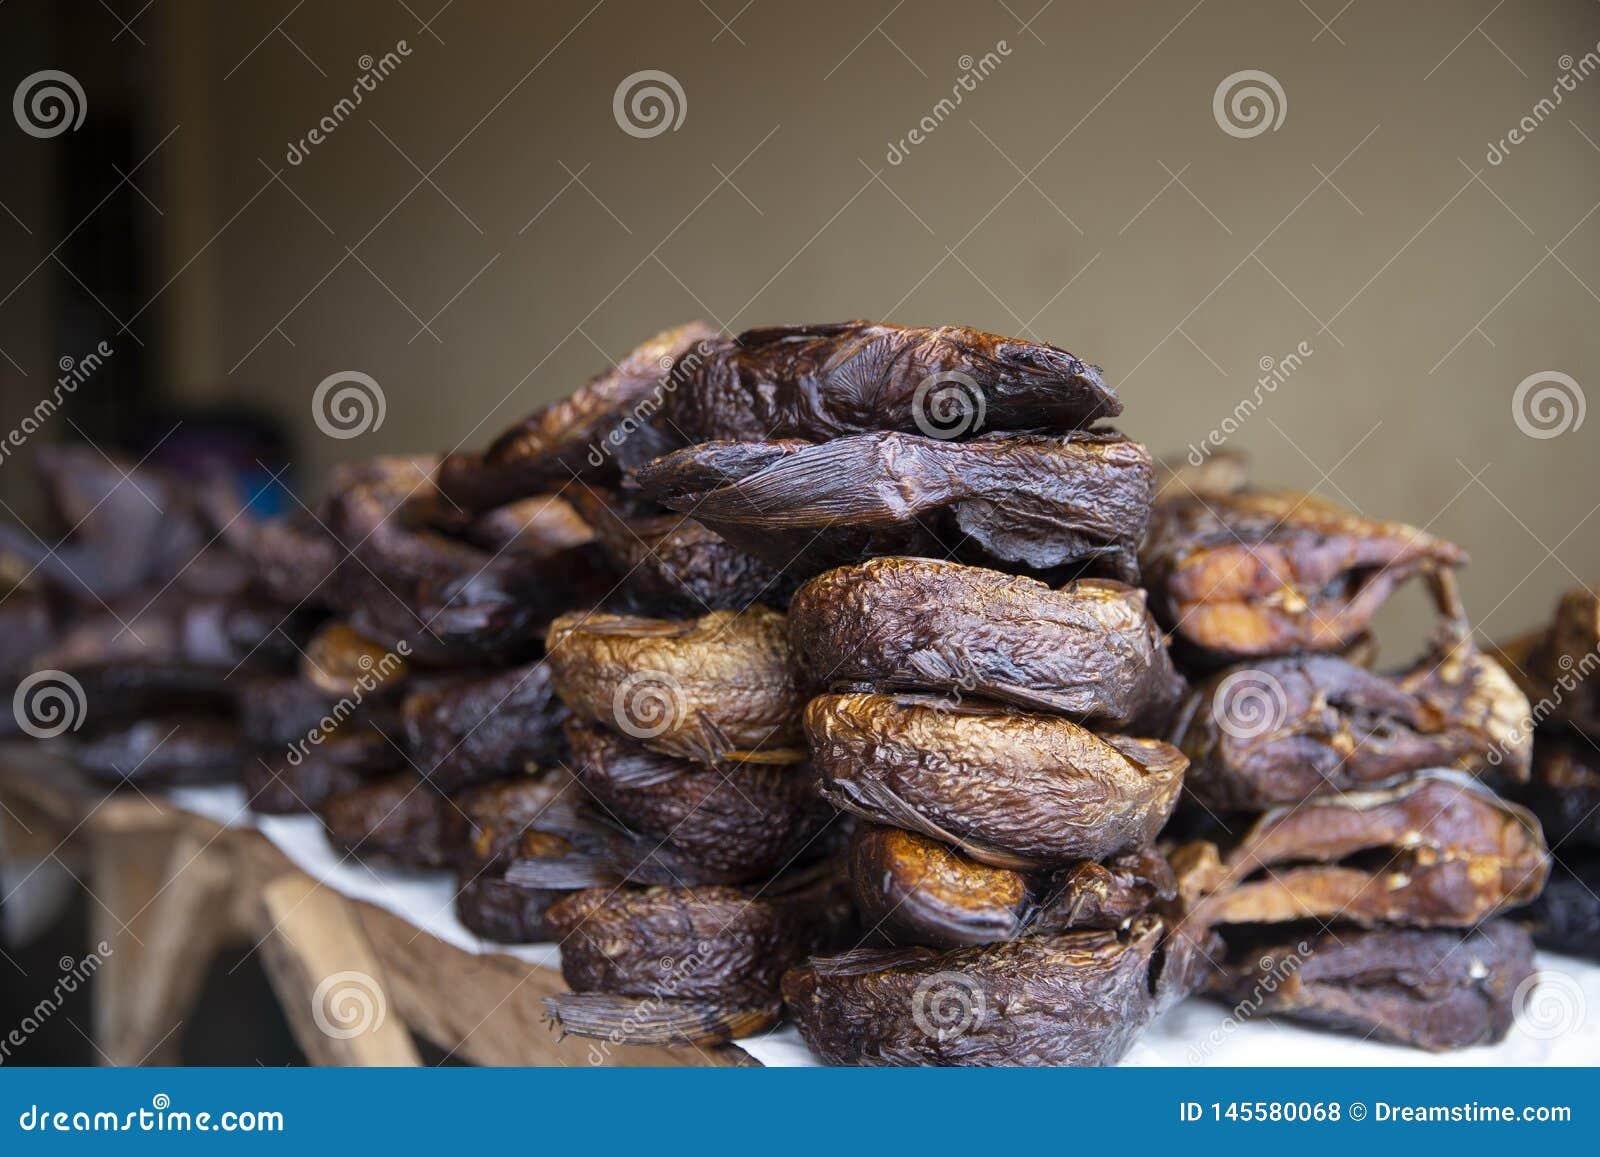 Dried Fish from Ghana Market